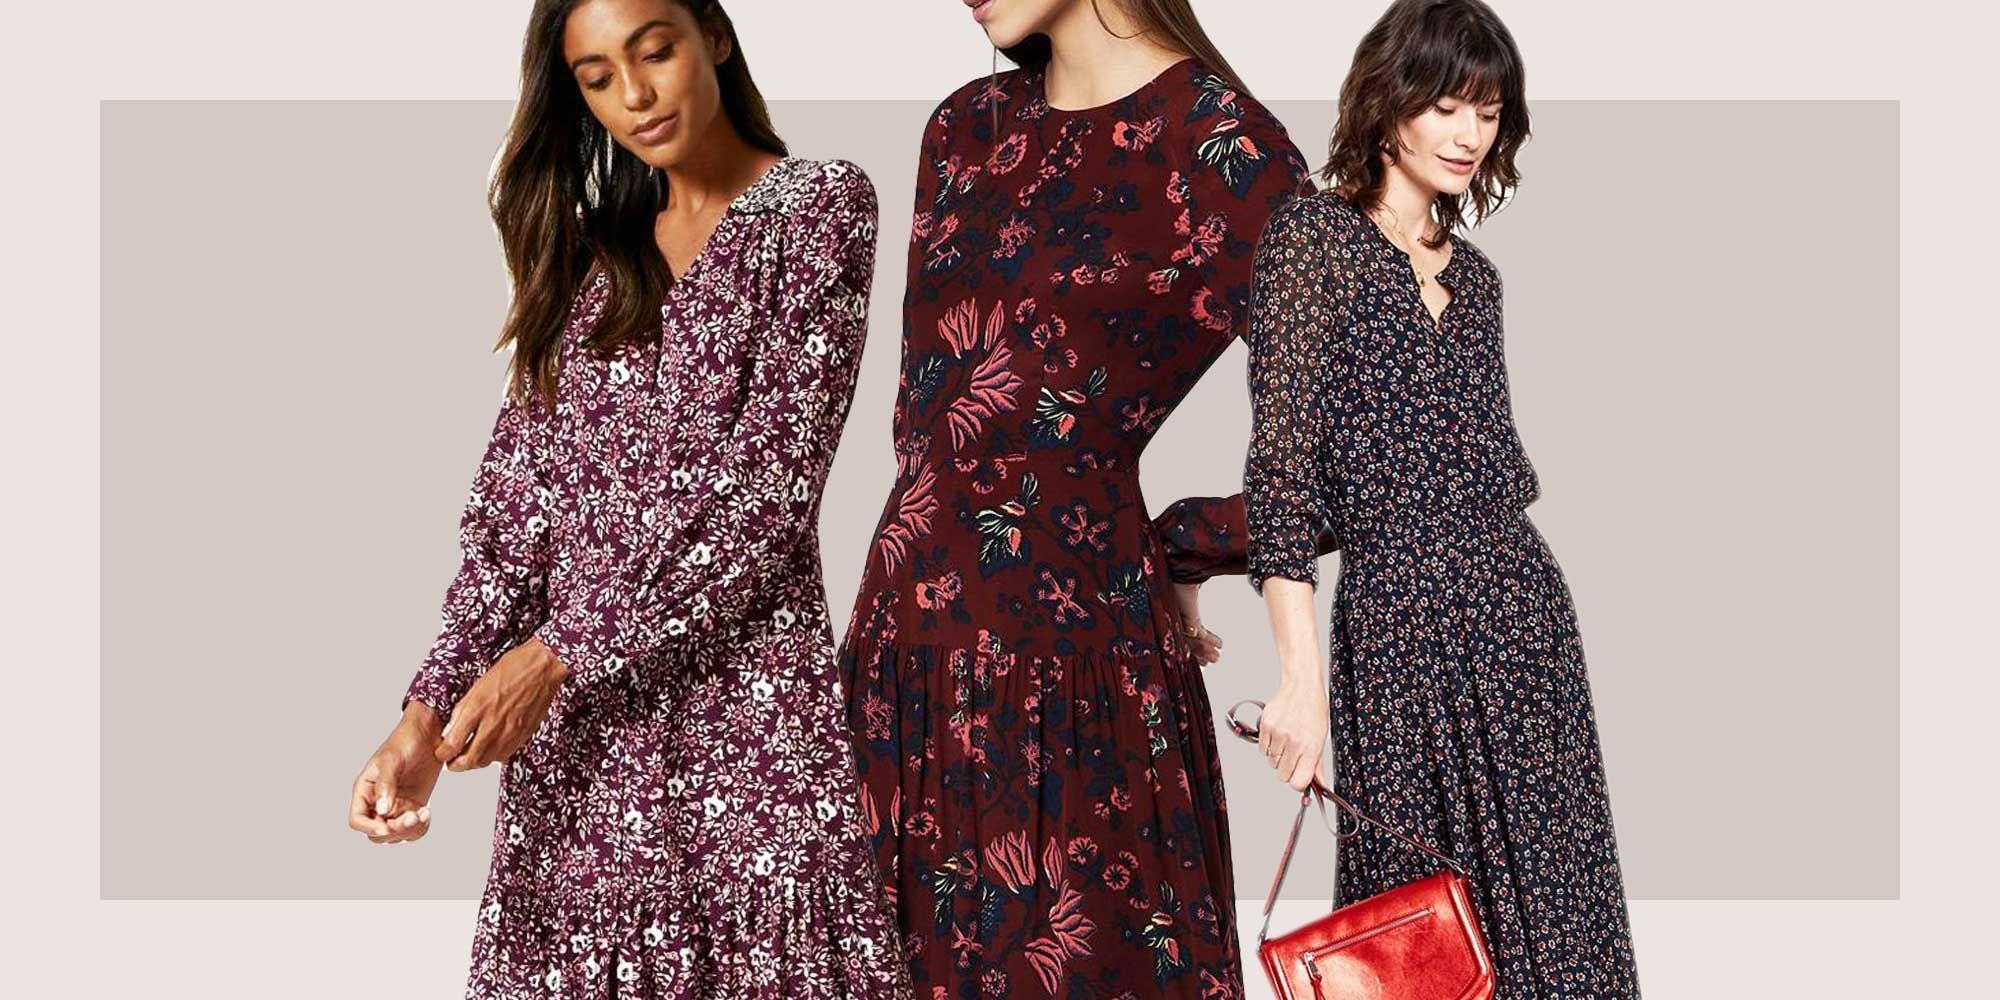 Long-sleeve maxi dresses